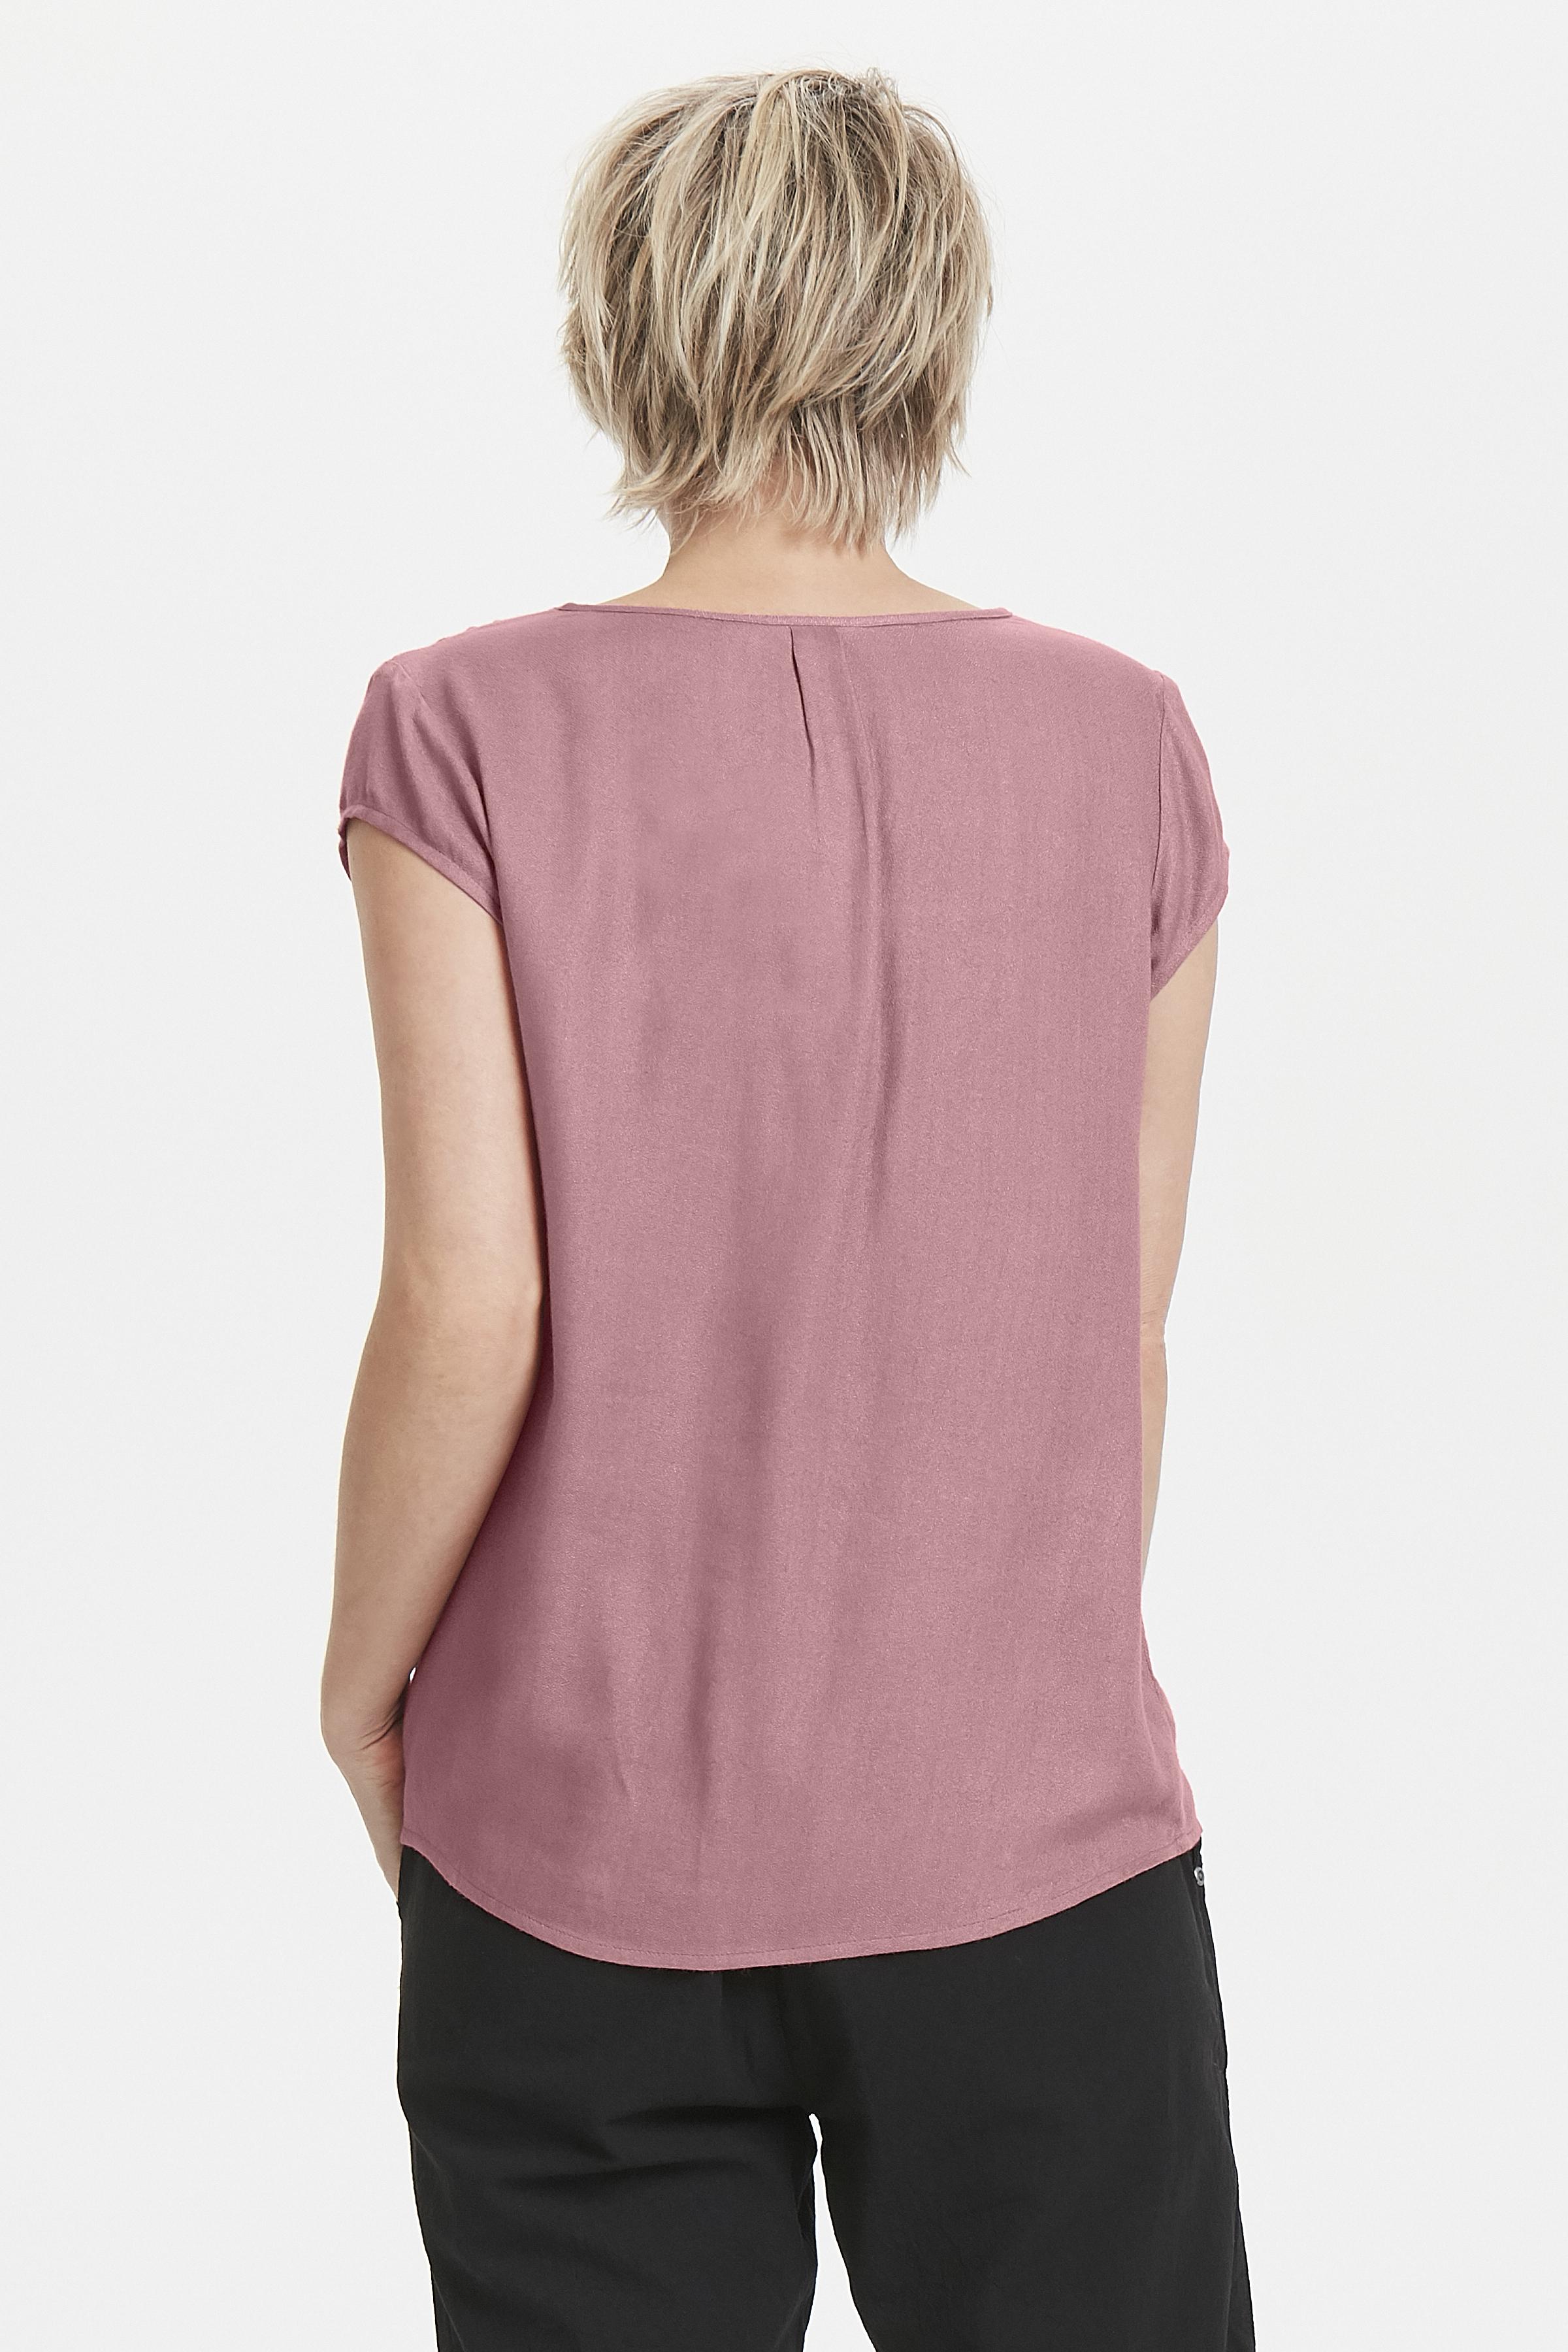 Staub erika Kurzarm-Bluse  von Bon'A Parte – Shoppen Sie Staub erika Kurzarm-Bluse  ab Gr. S-2XL hier